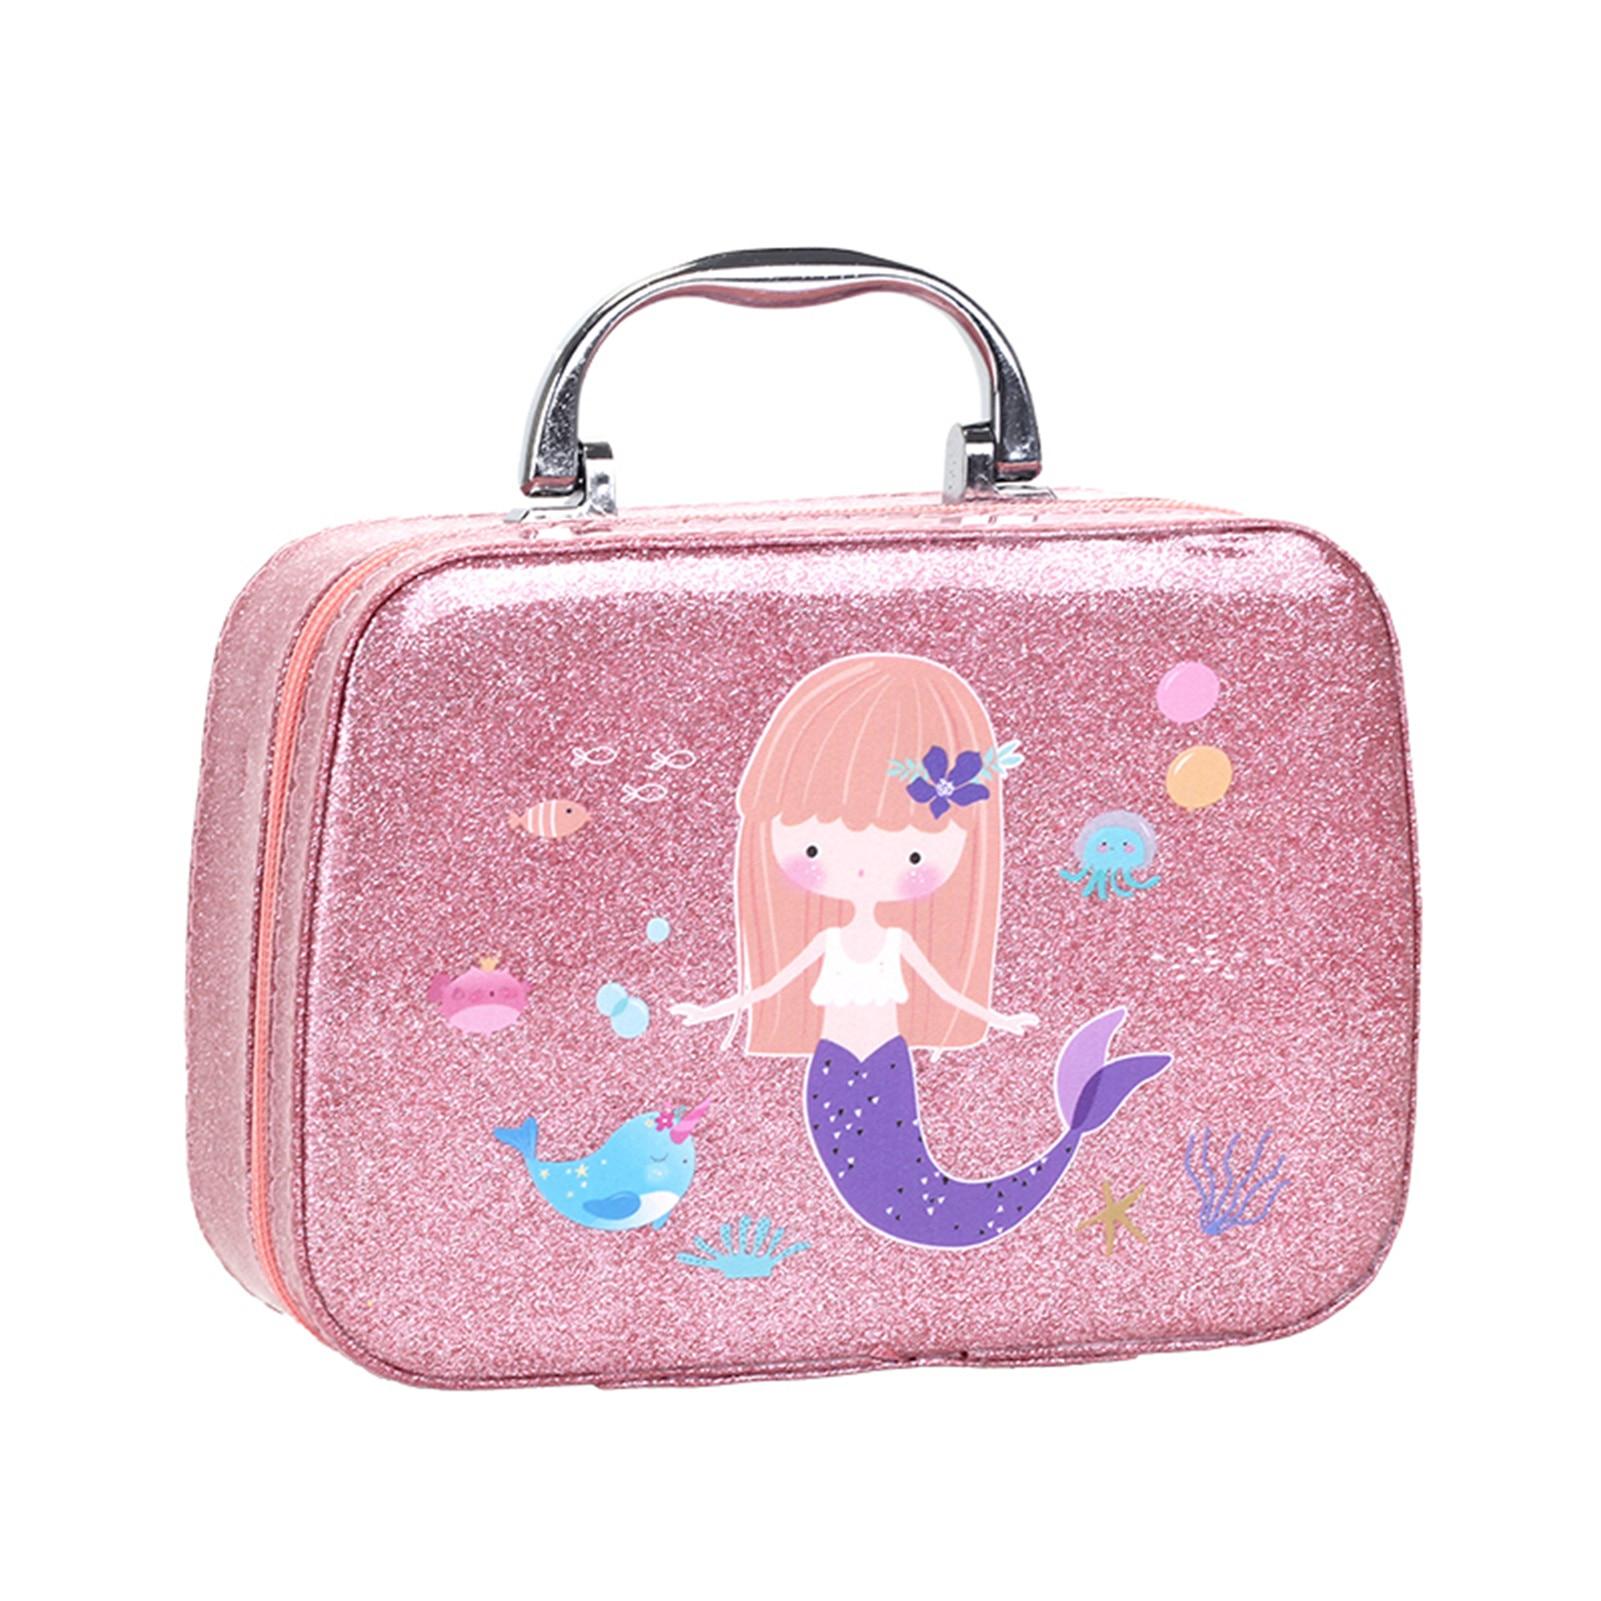 Children Makeup Set Safe Baby Girls Pretend Play Toys Princess Dress Up Cosmetic Bag Make Up Kit Great Gift For Kids